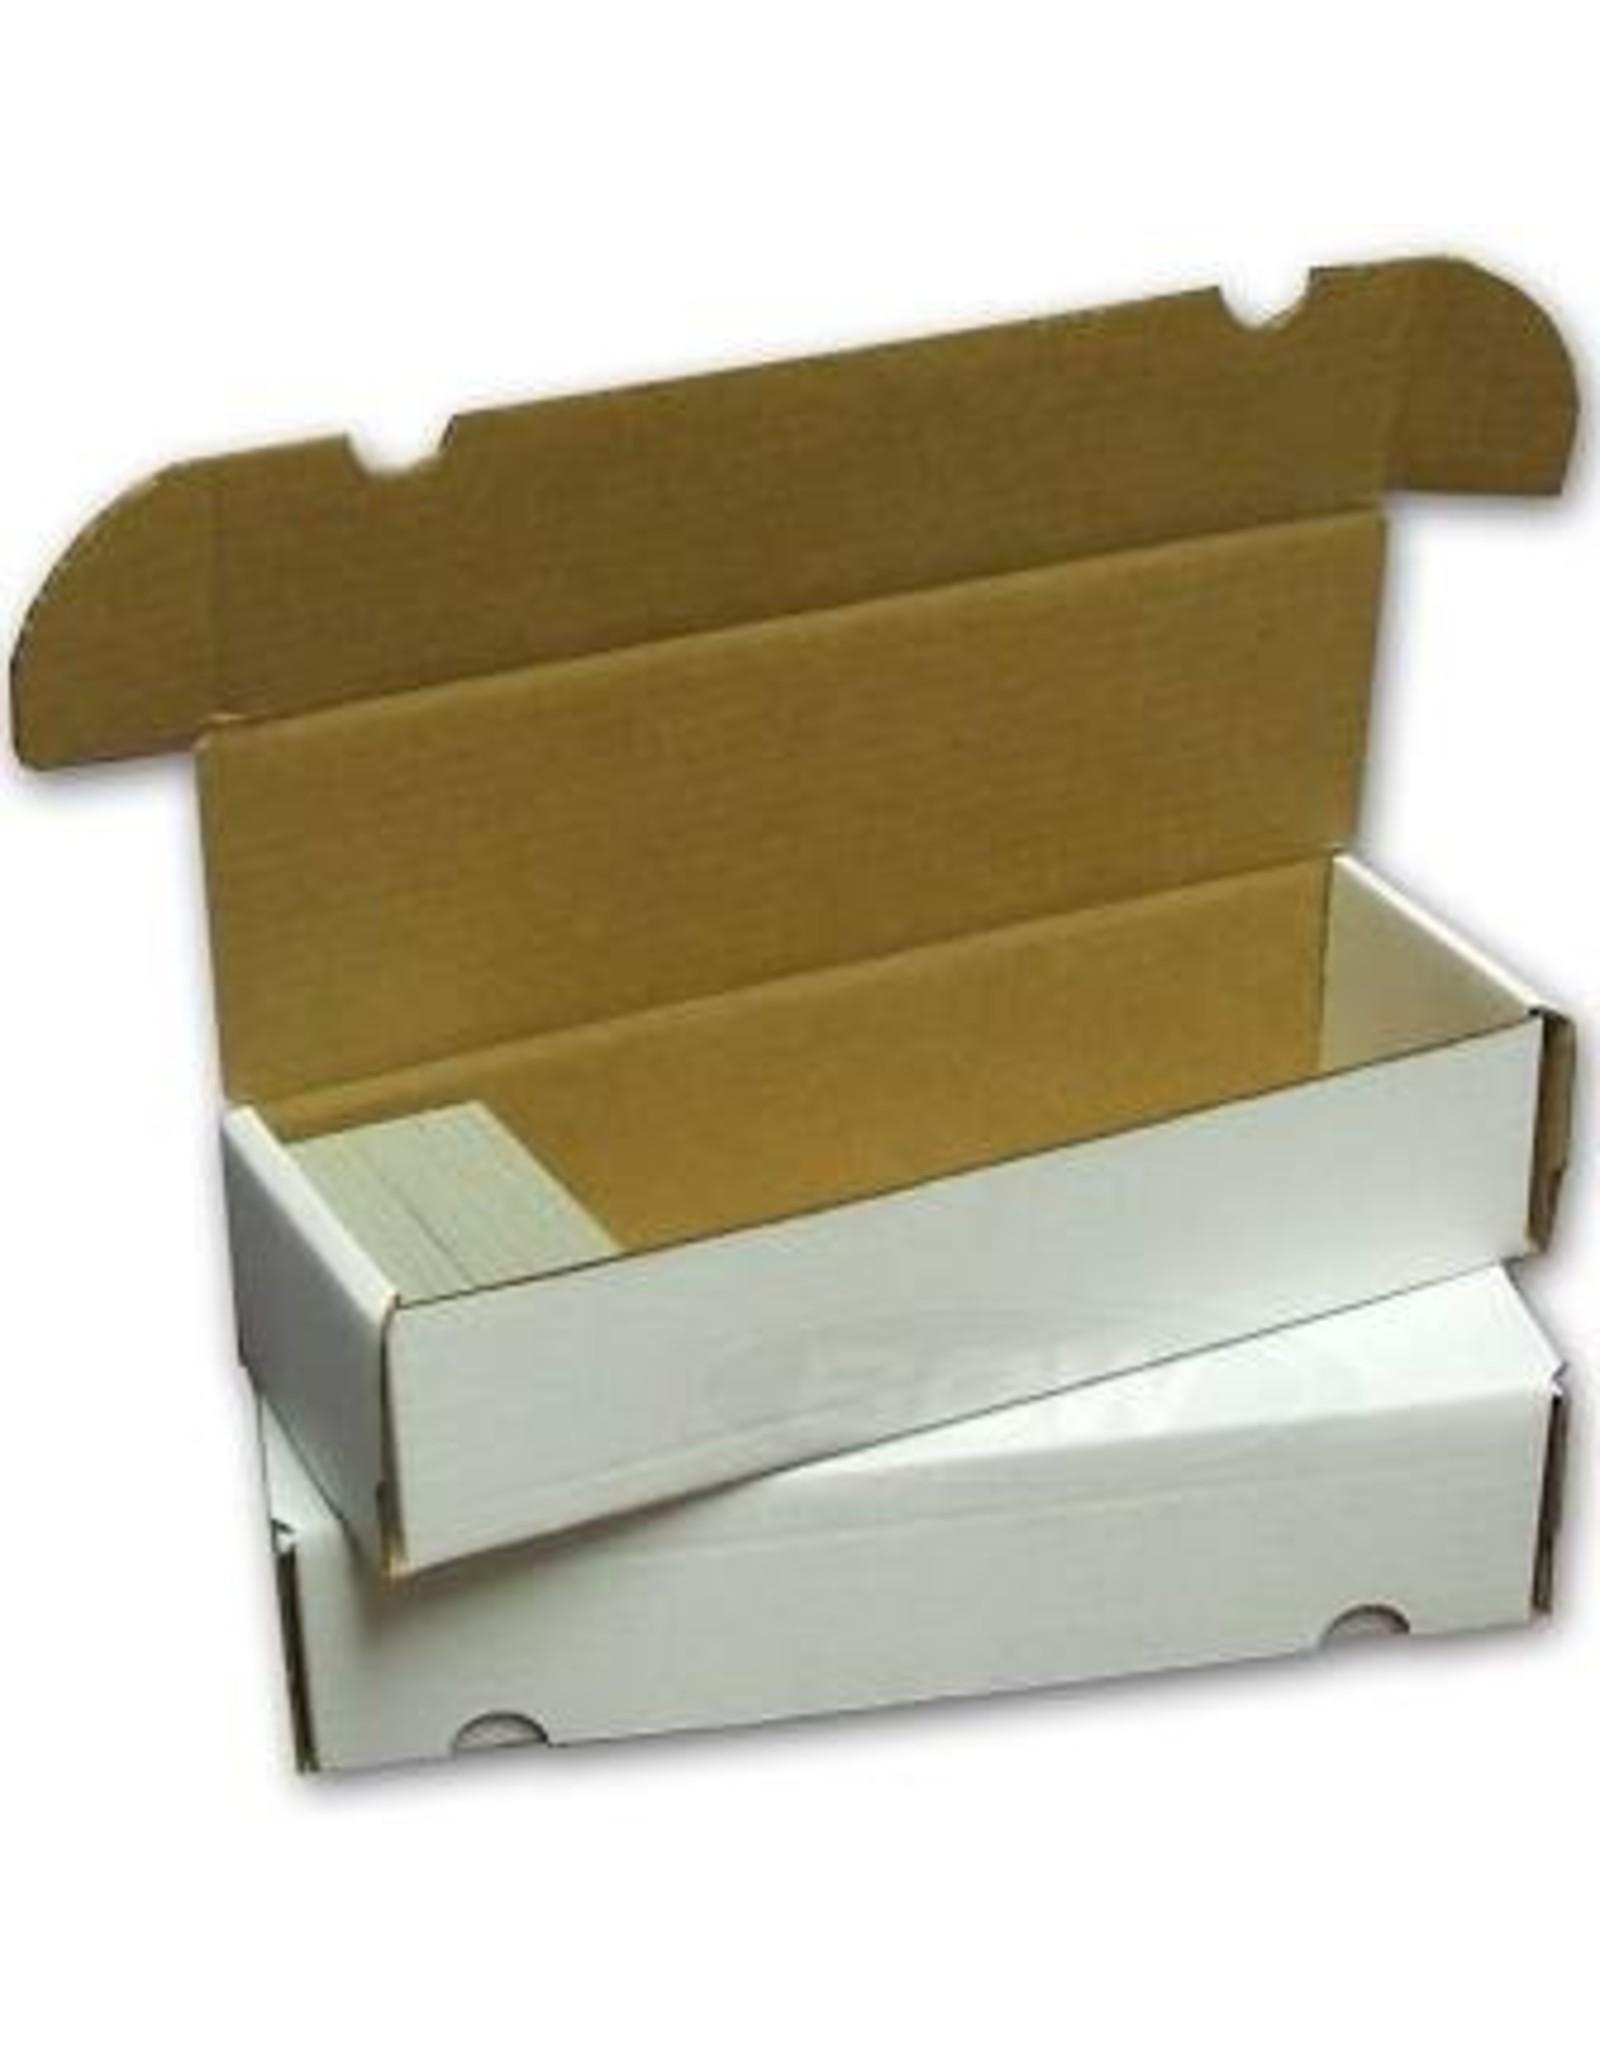 BCD Cardboard Box - 660 Count